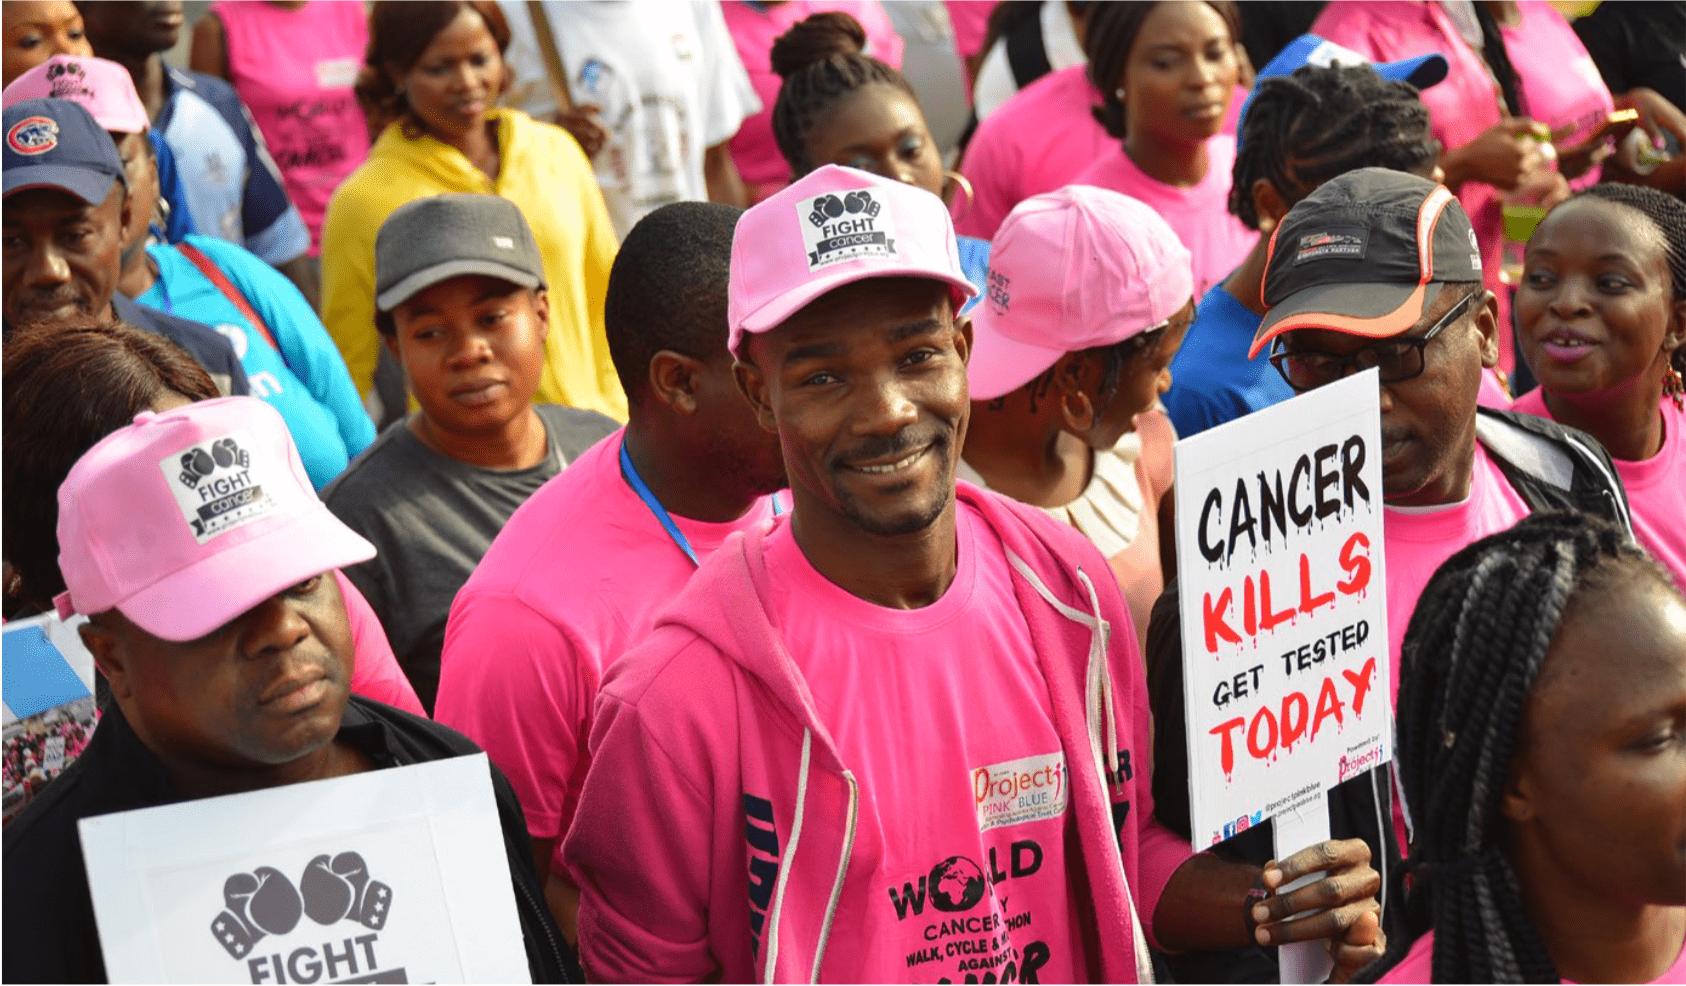 Cancer awareness campaign